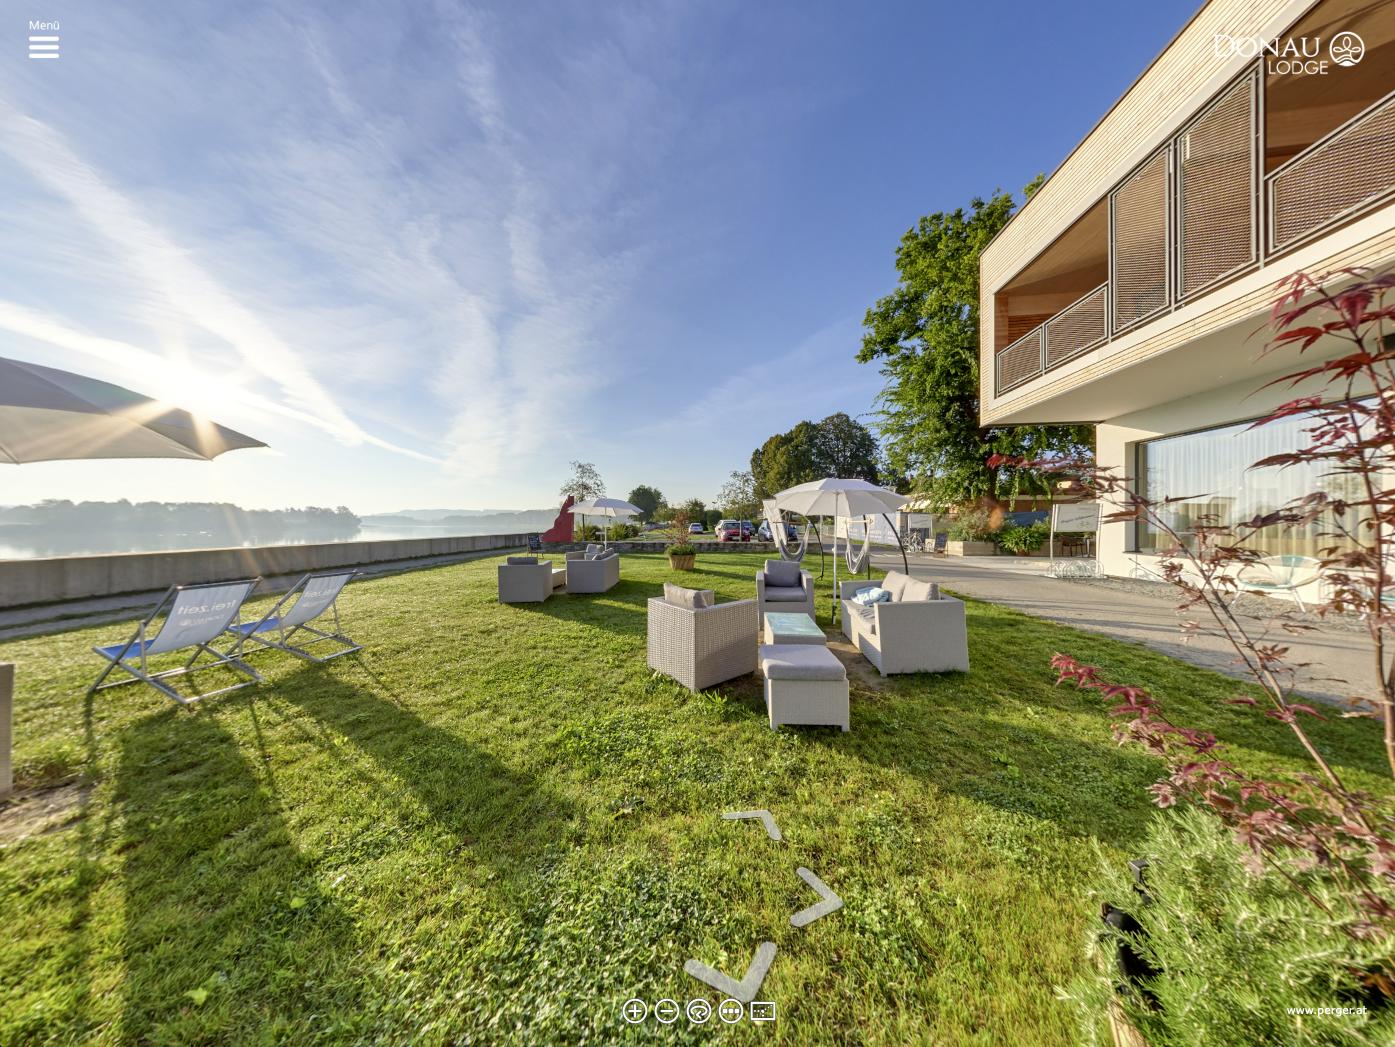 Donau Lodge Ybbs an der Donau, 360° Panorama, Virtuelle Tour von Fotograf Johann Perger, Melk, Pöchlarn